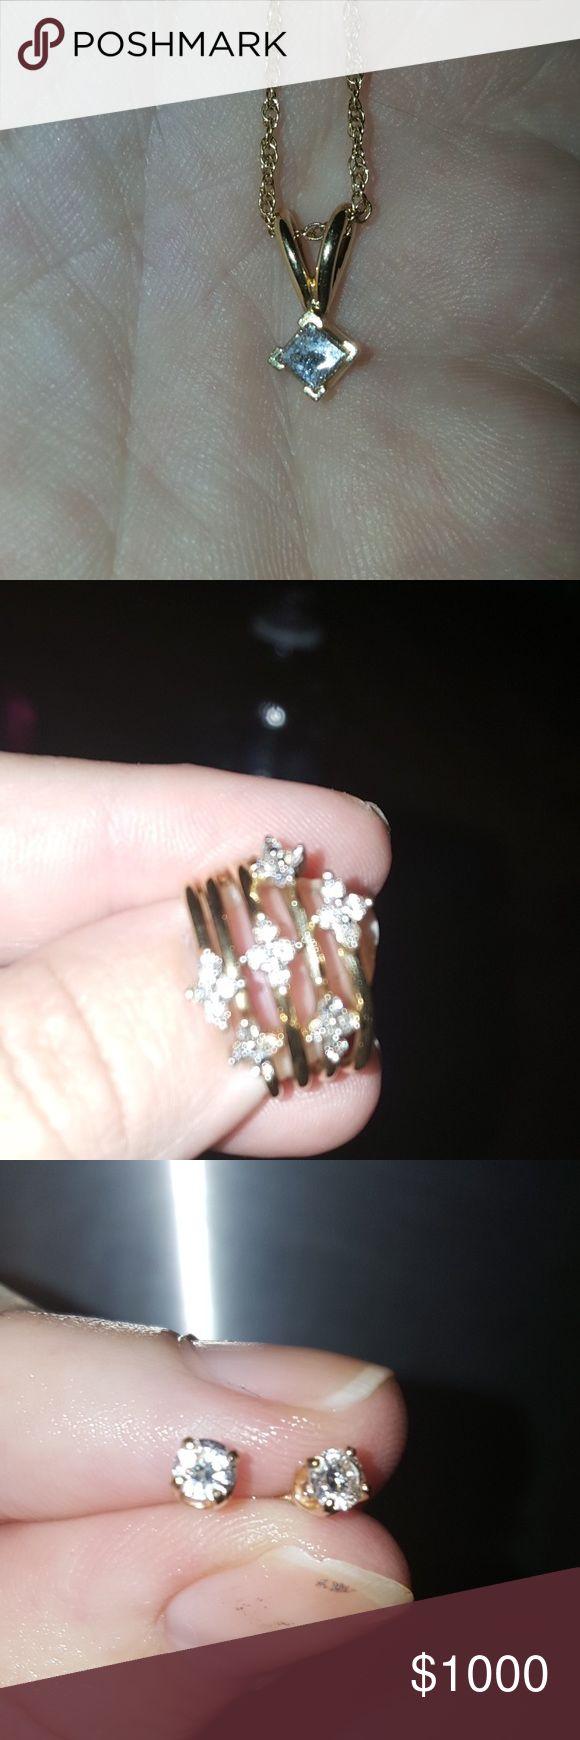 14 k gold jewelry bundle .50 ct diamond earrings and .50 ct diamond necklace and .50 ct diamond ring. The earrings and necklace is 14 k gold yellow and ring is 10 k gold yellow and is size 6 great deal ring was 999. Earrings were 899 necklaces was 1299 Jewelry Earrings